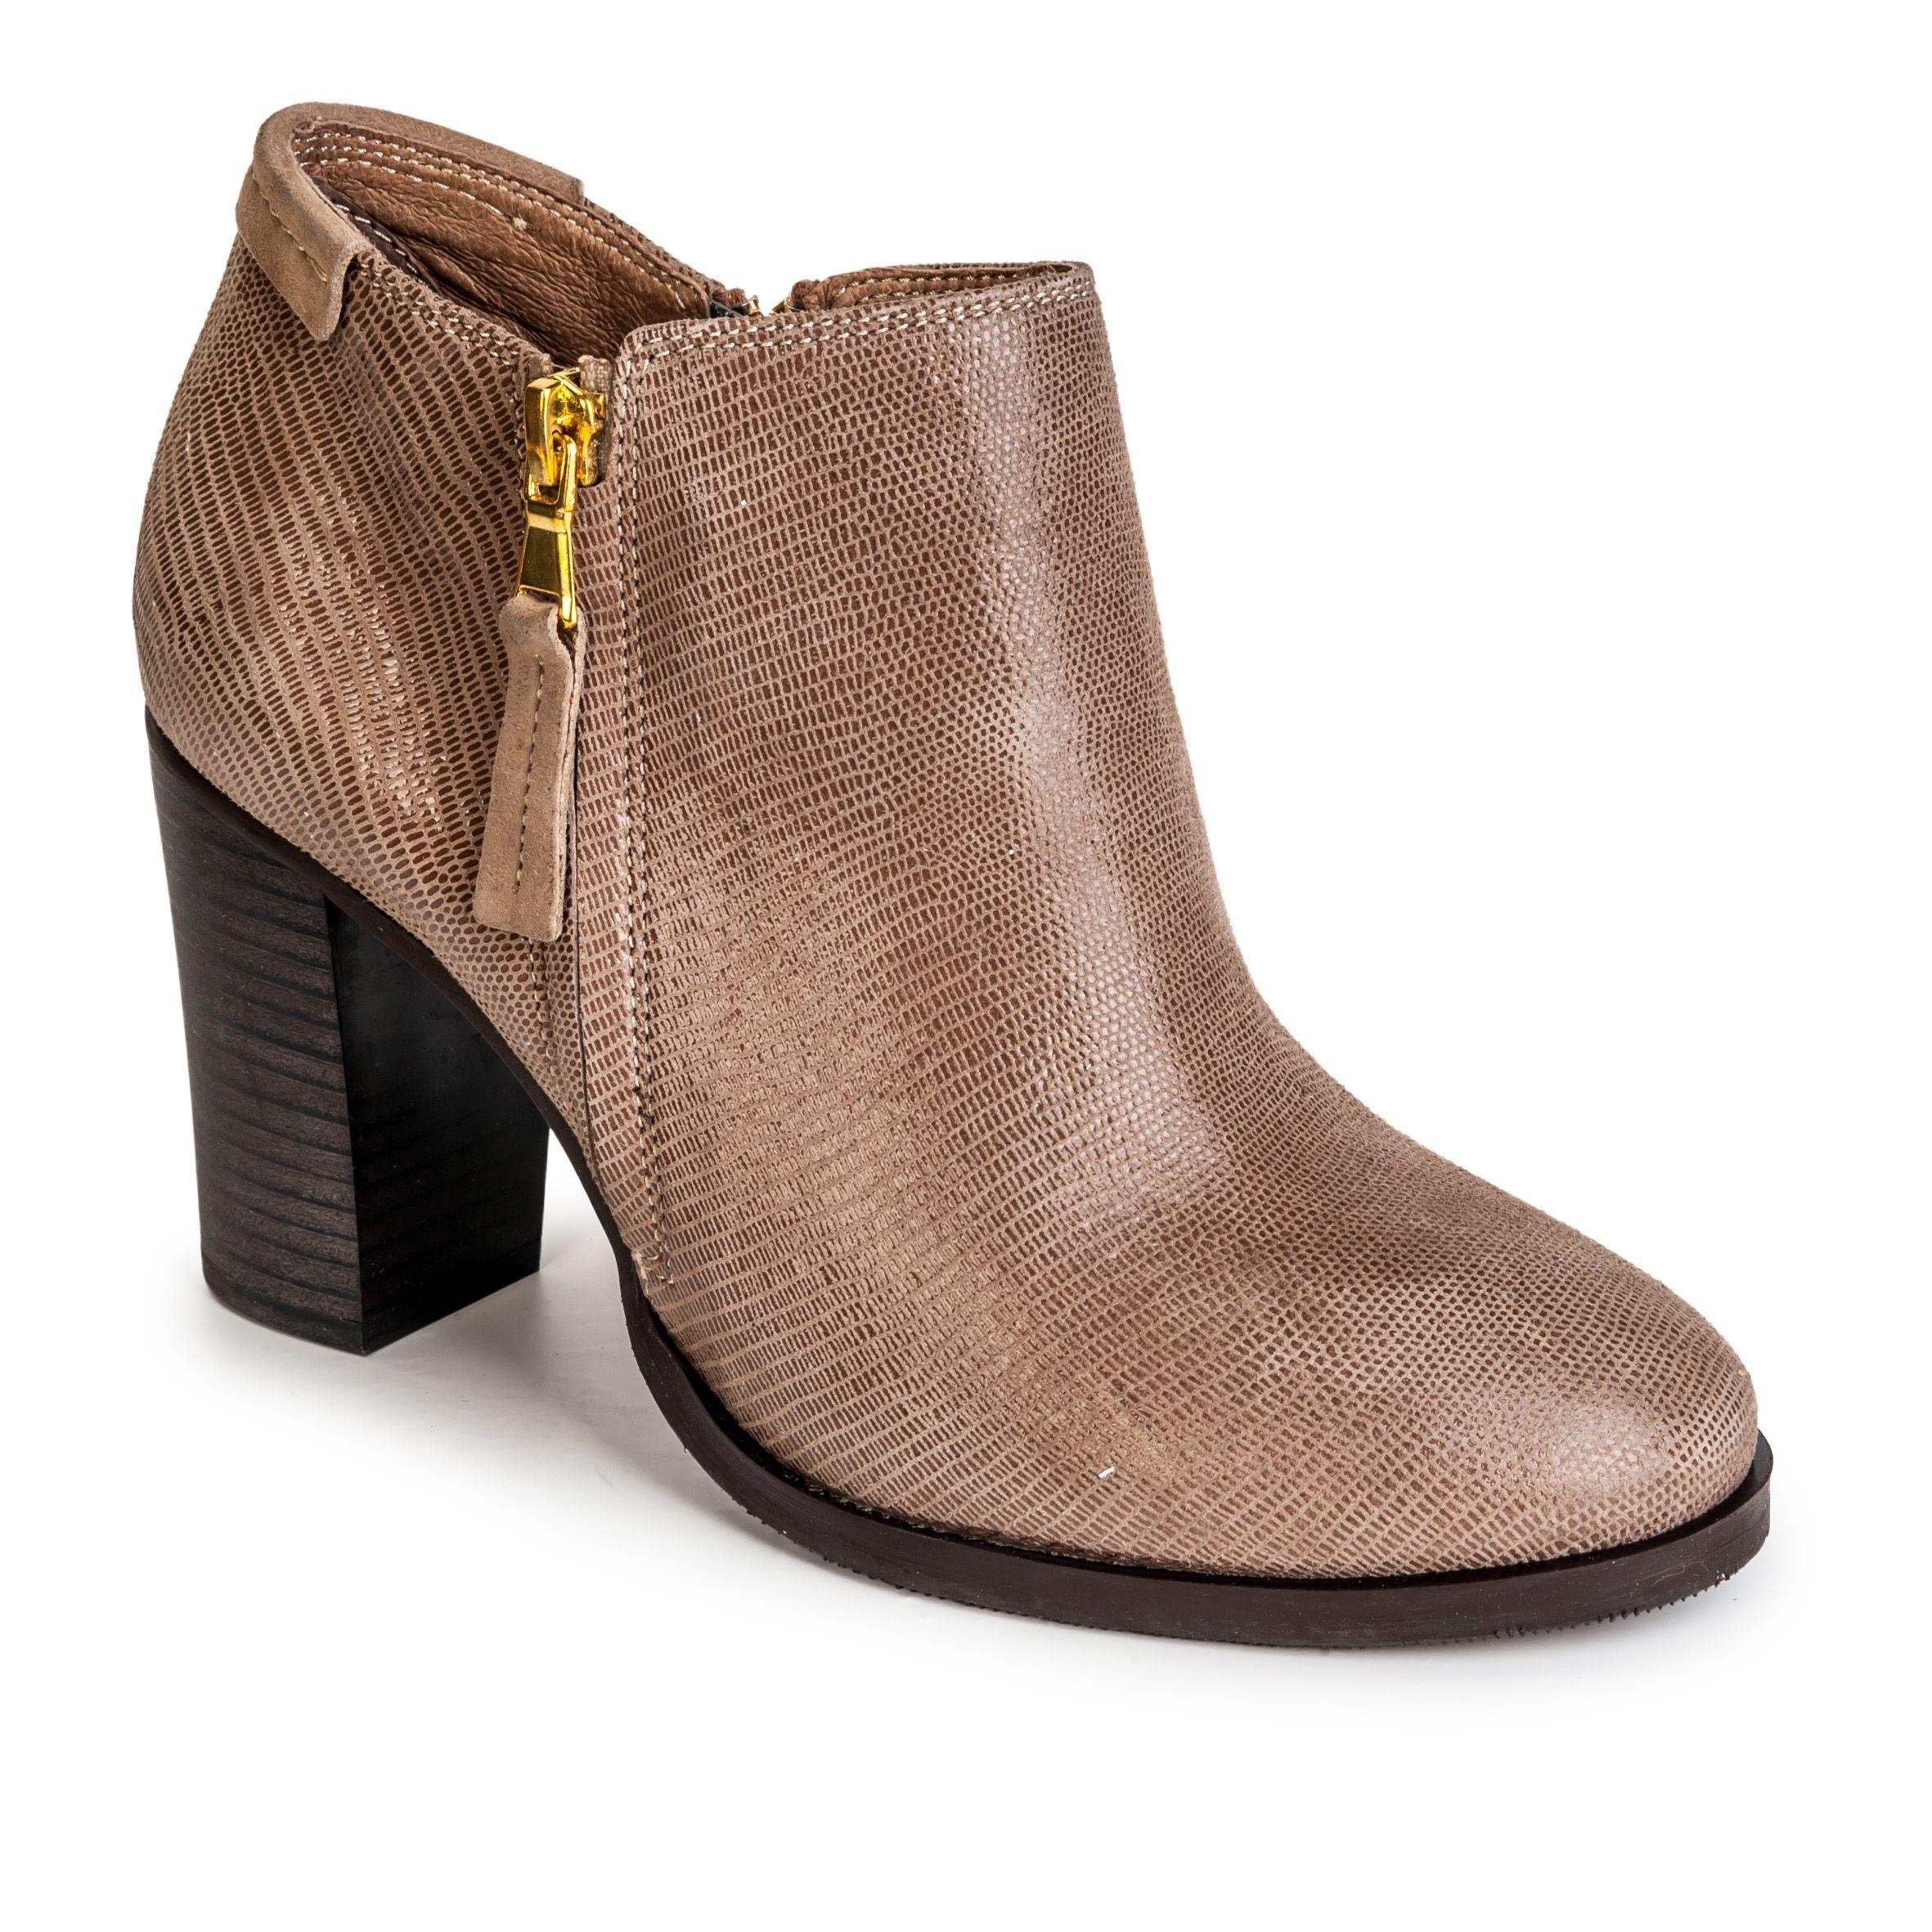 Nessi 715 N Botki Galeria Sellingo Boots Heels Ankle Boot